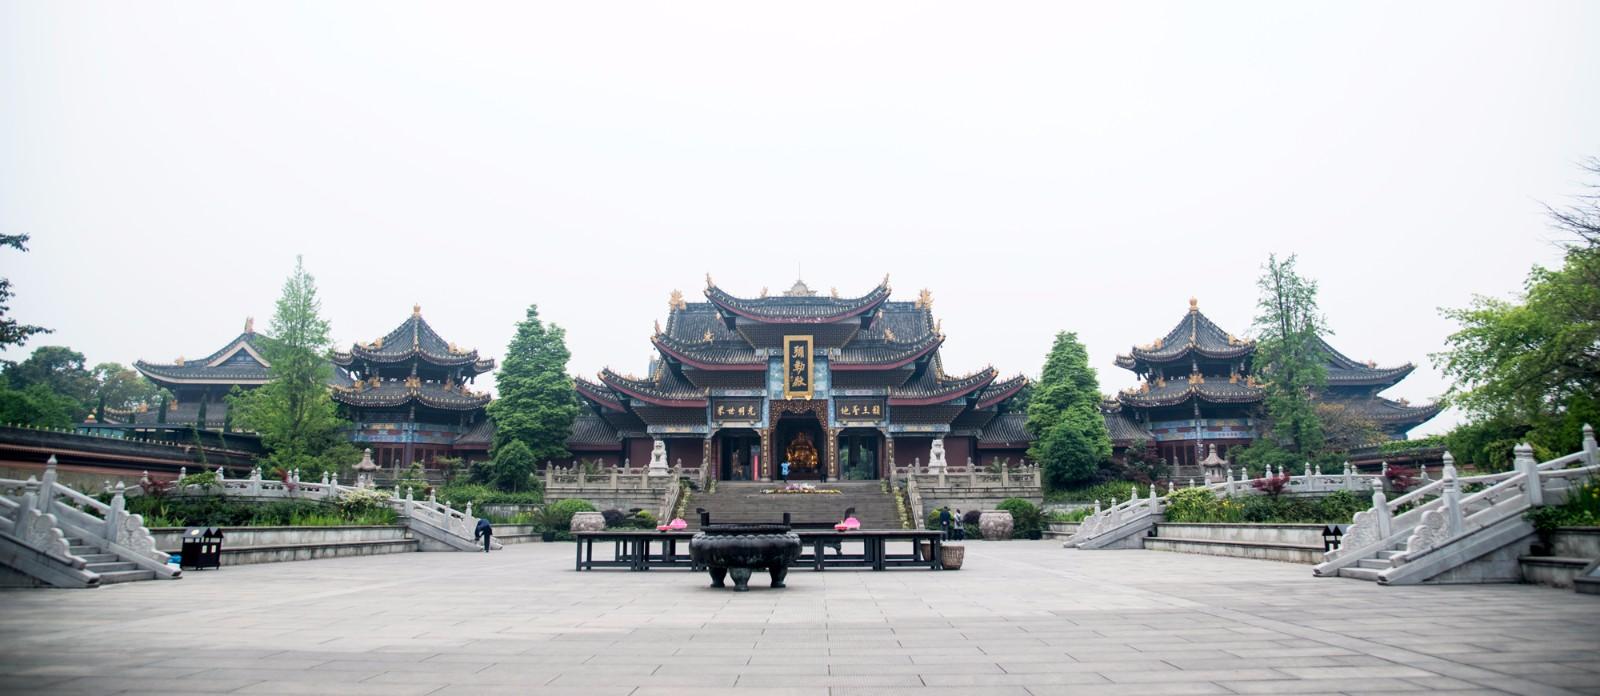 Mount Emeishan tour